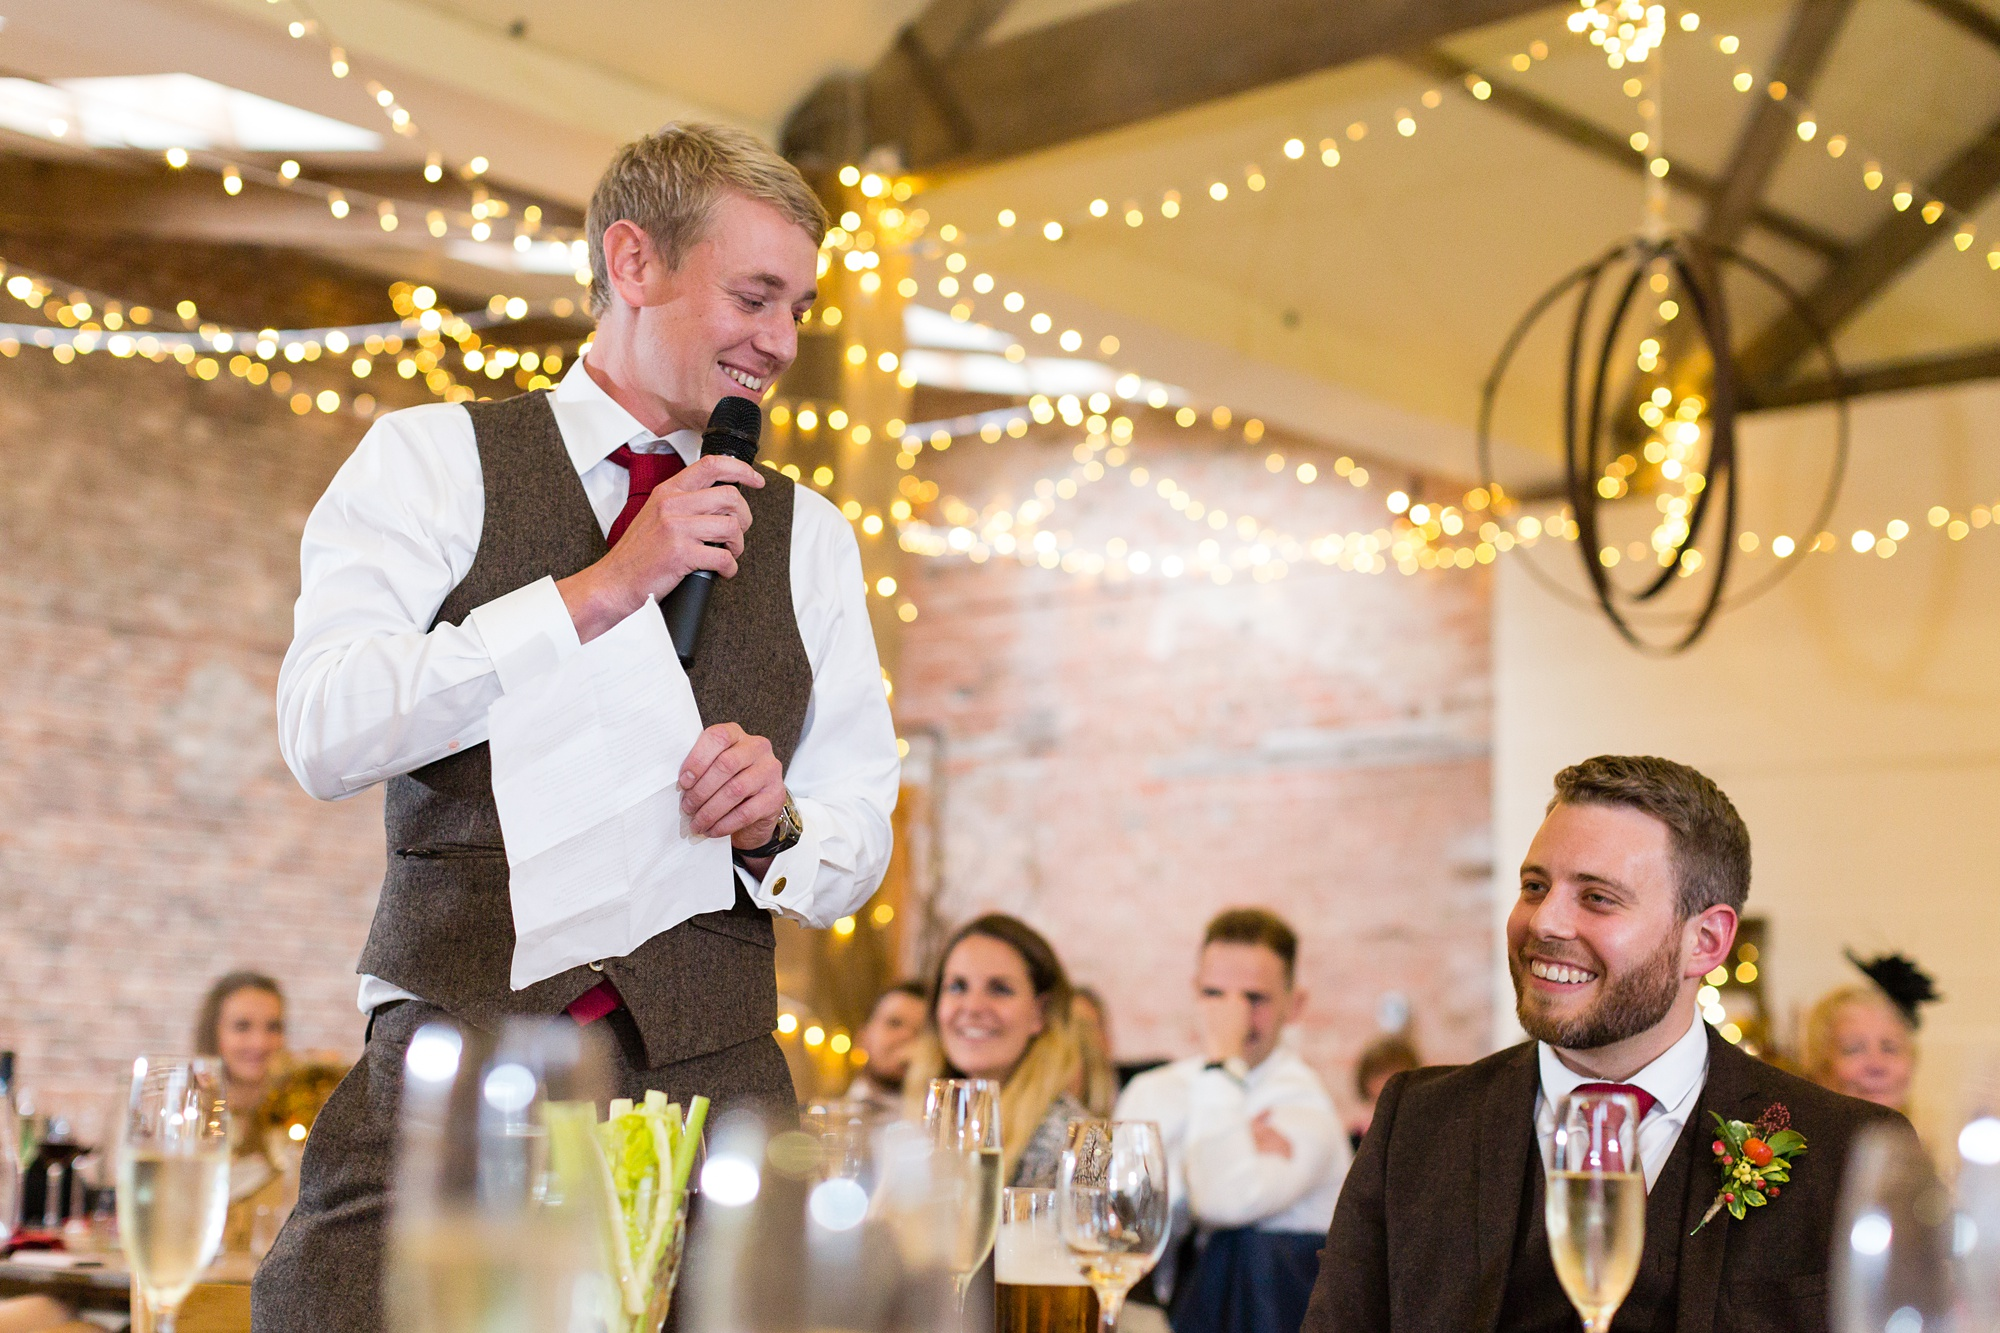 Barmbyfield Barn Wedding Photography best man giving speeches